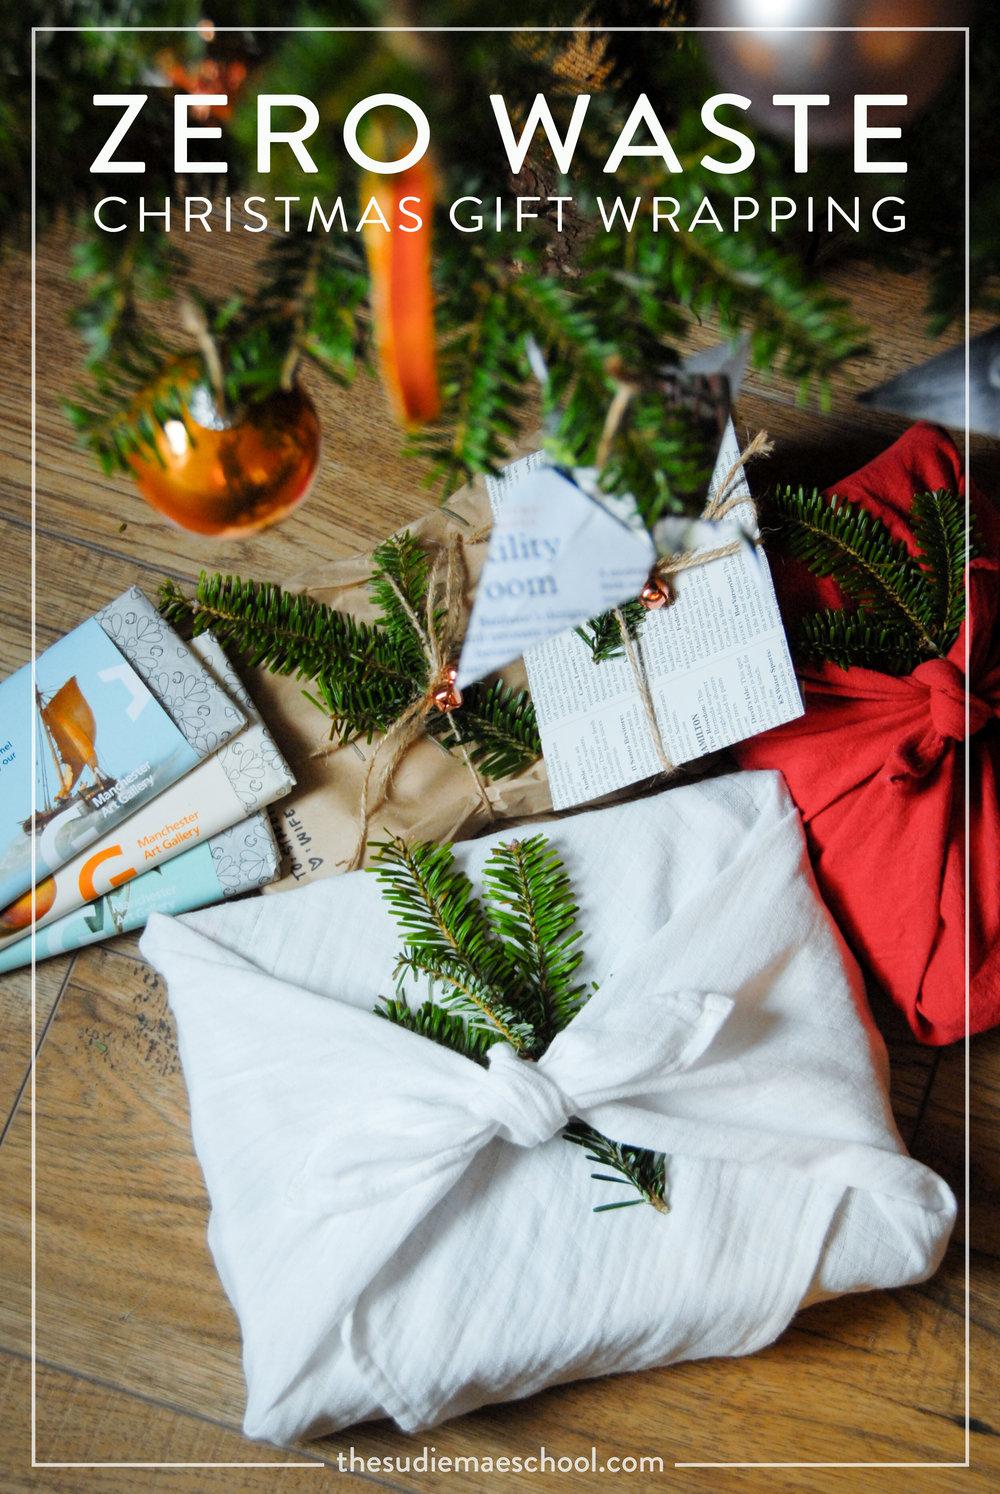 Zero Waste Christmas Gift Wrapping